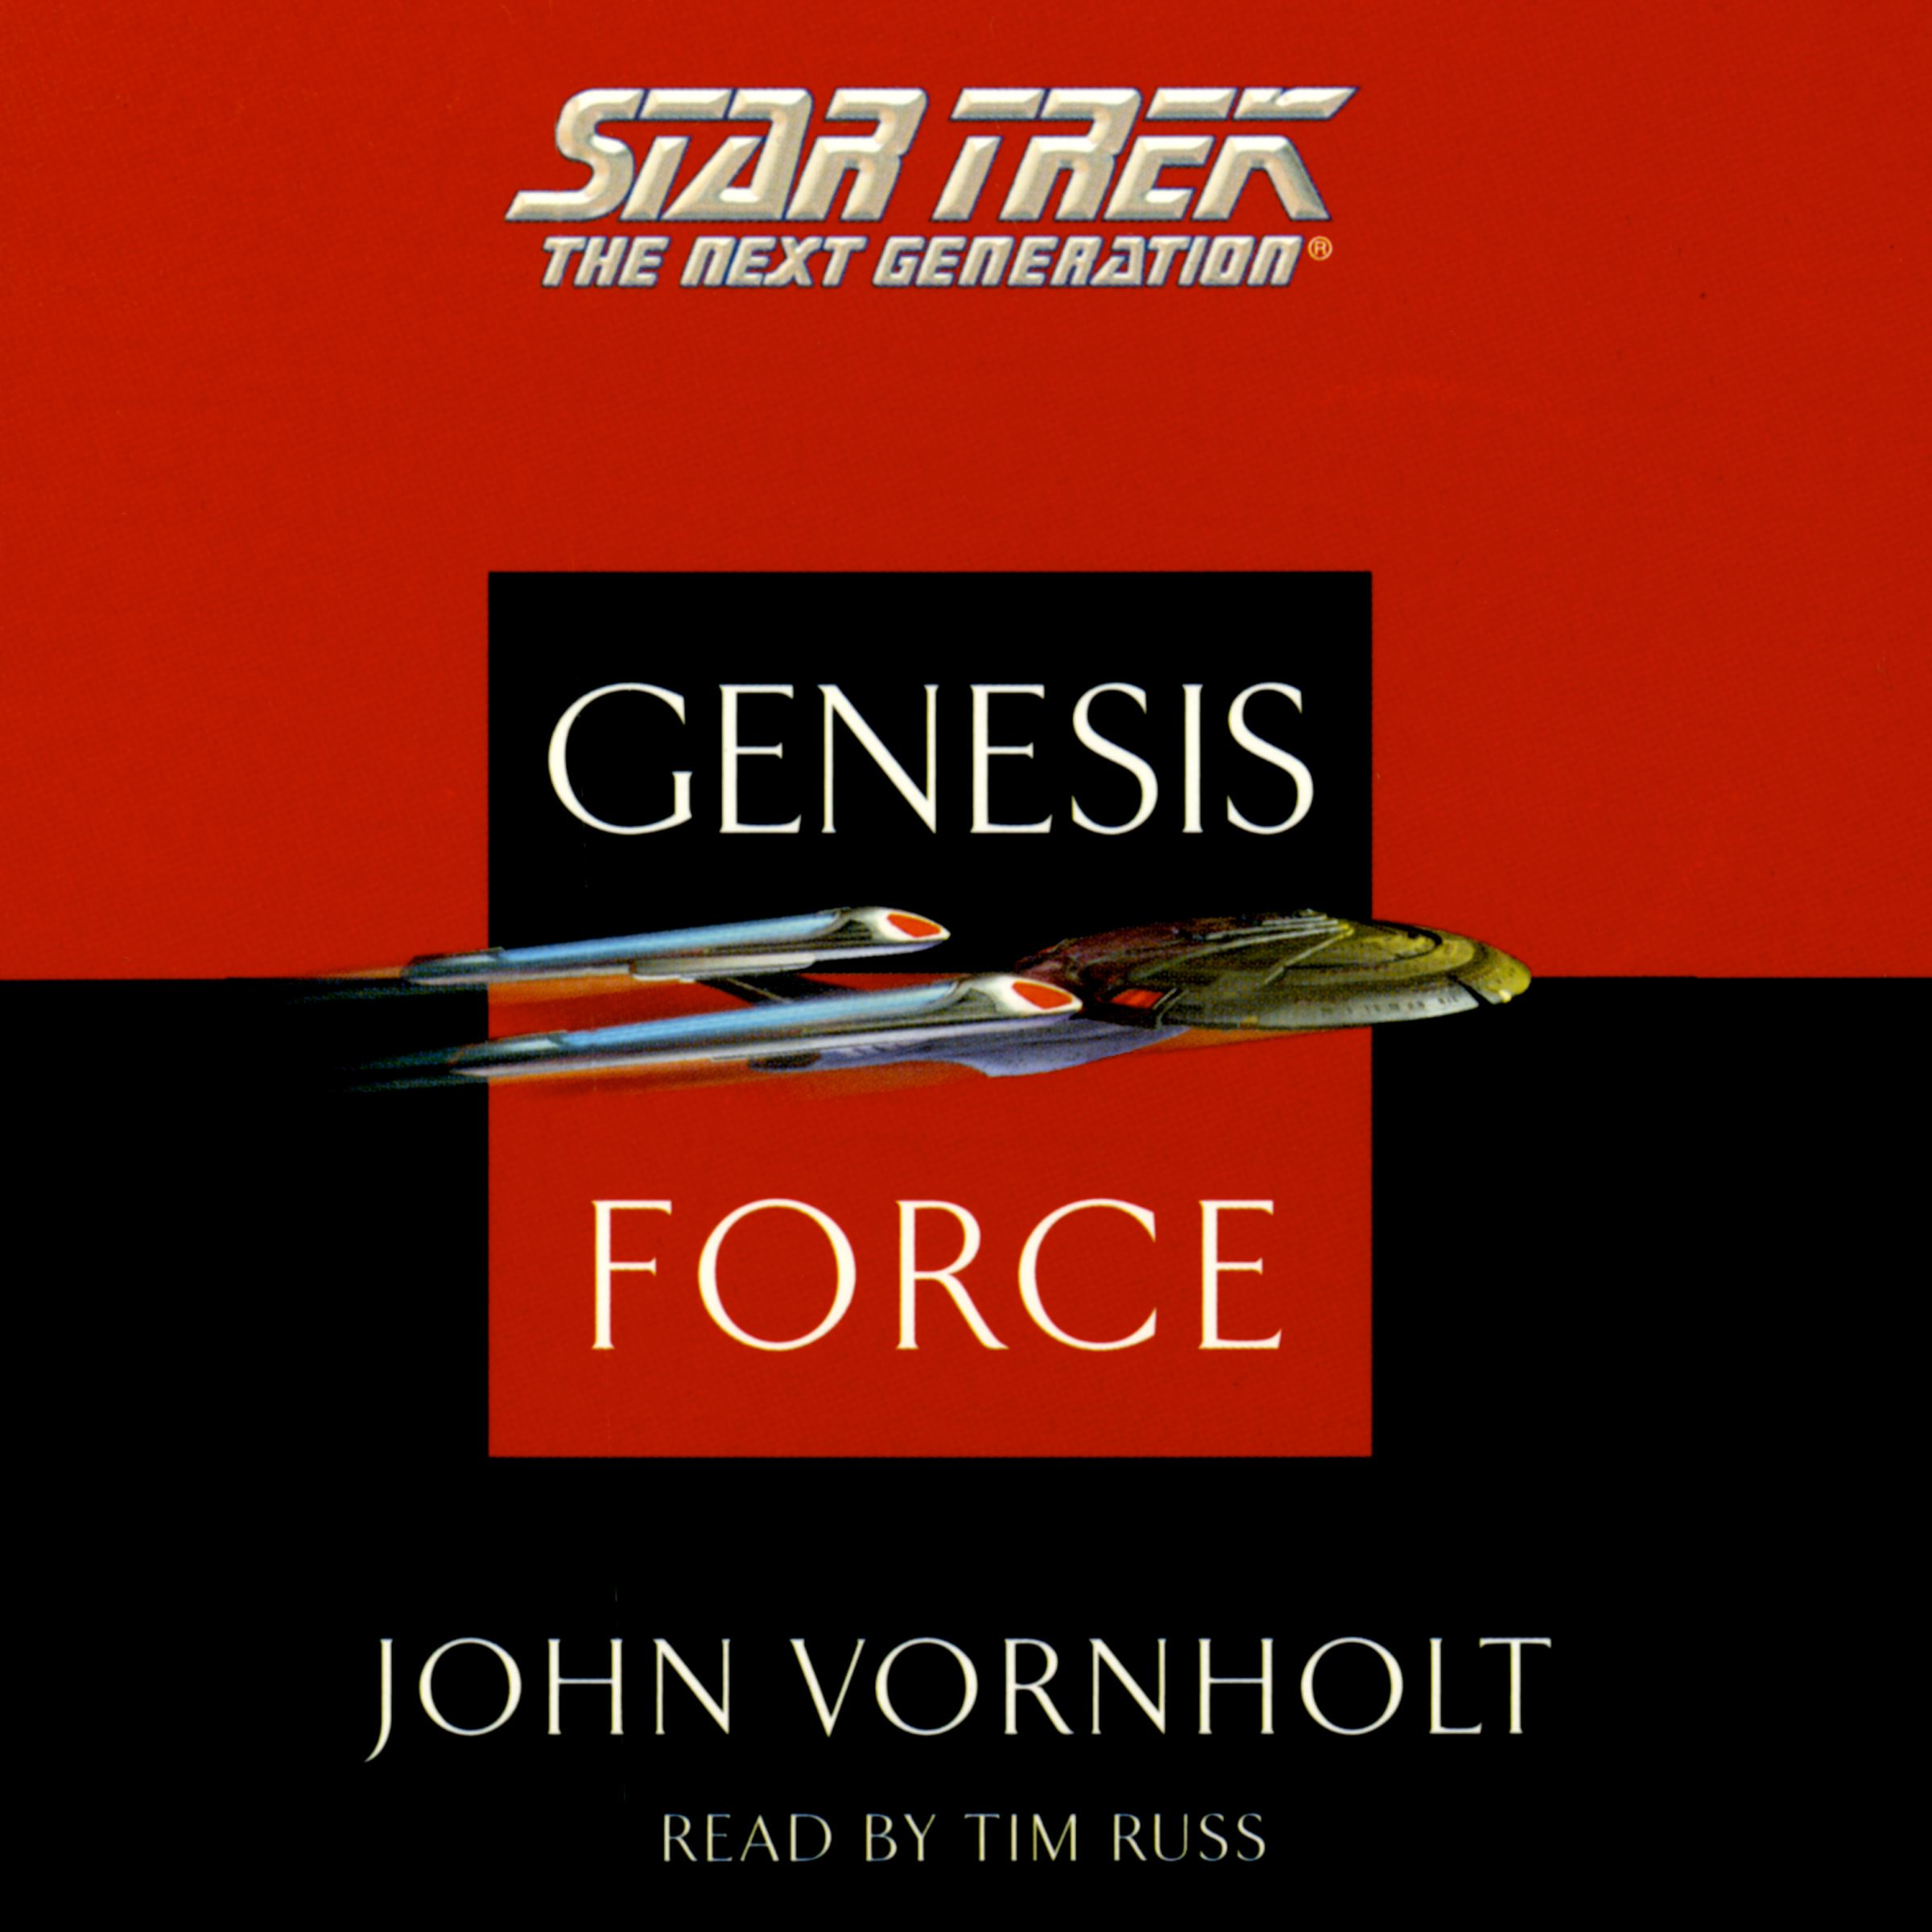 Star trek the next generation the genesis force 9781442368378 hr